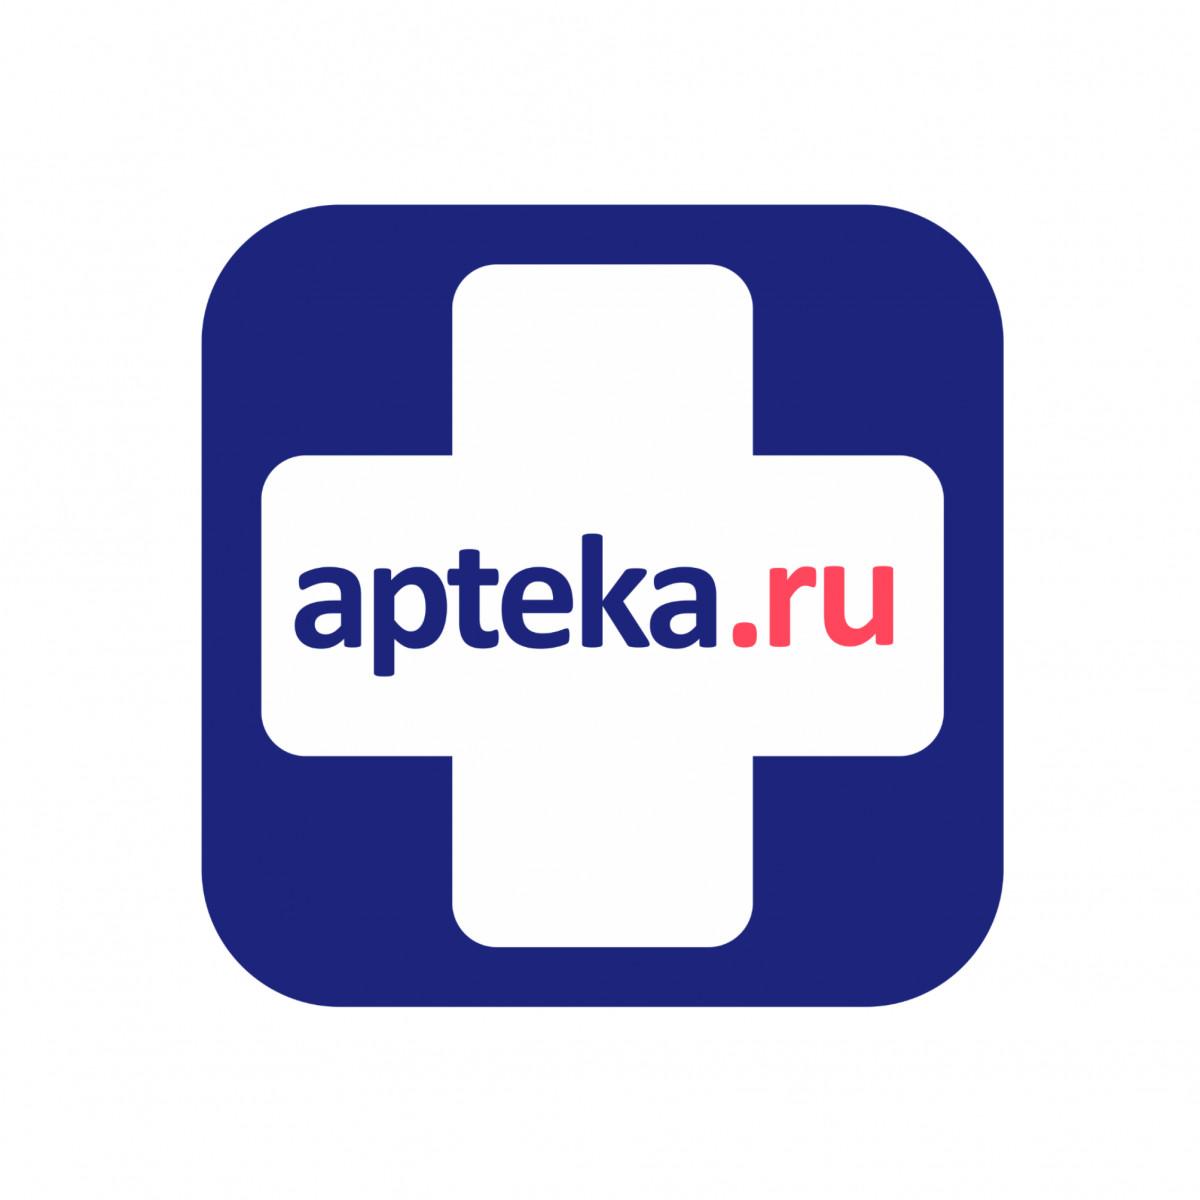 APTEKA.RU - скидка 10% на первый заказ